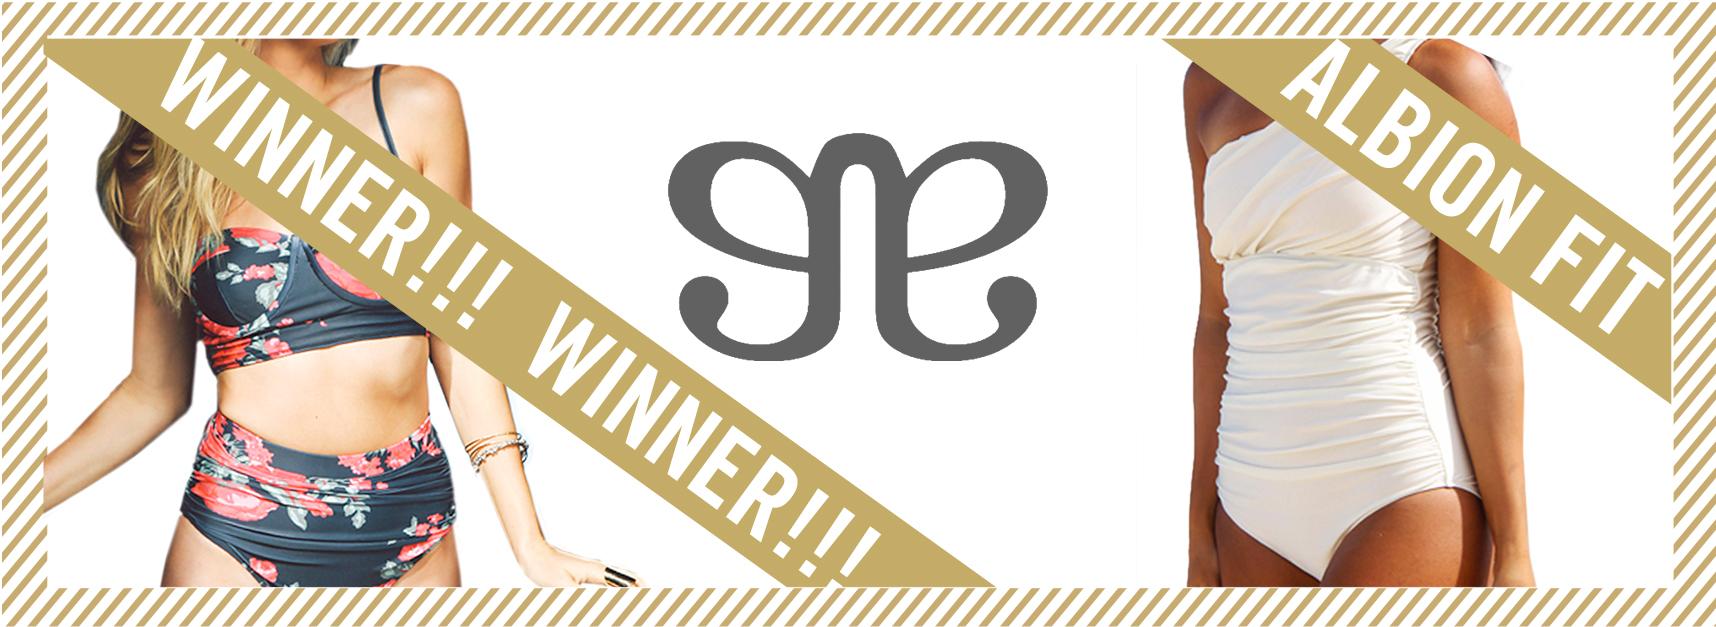 albion fit giveaway winner